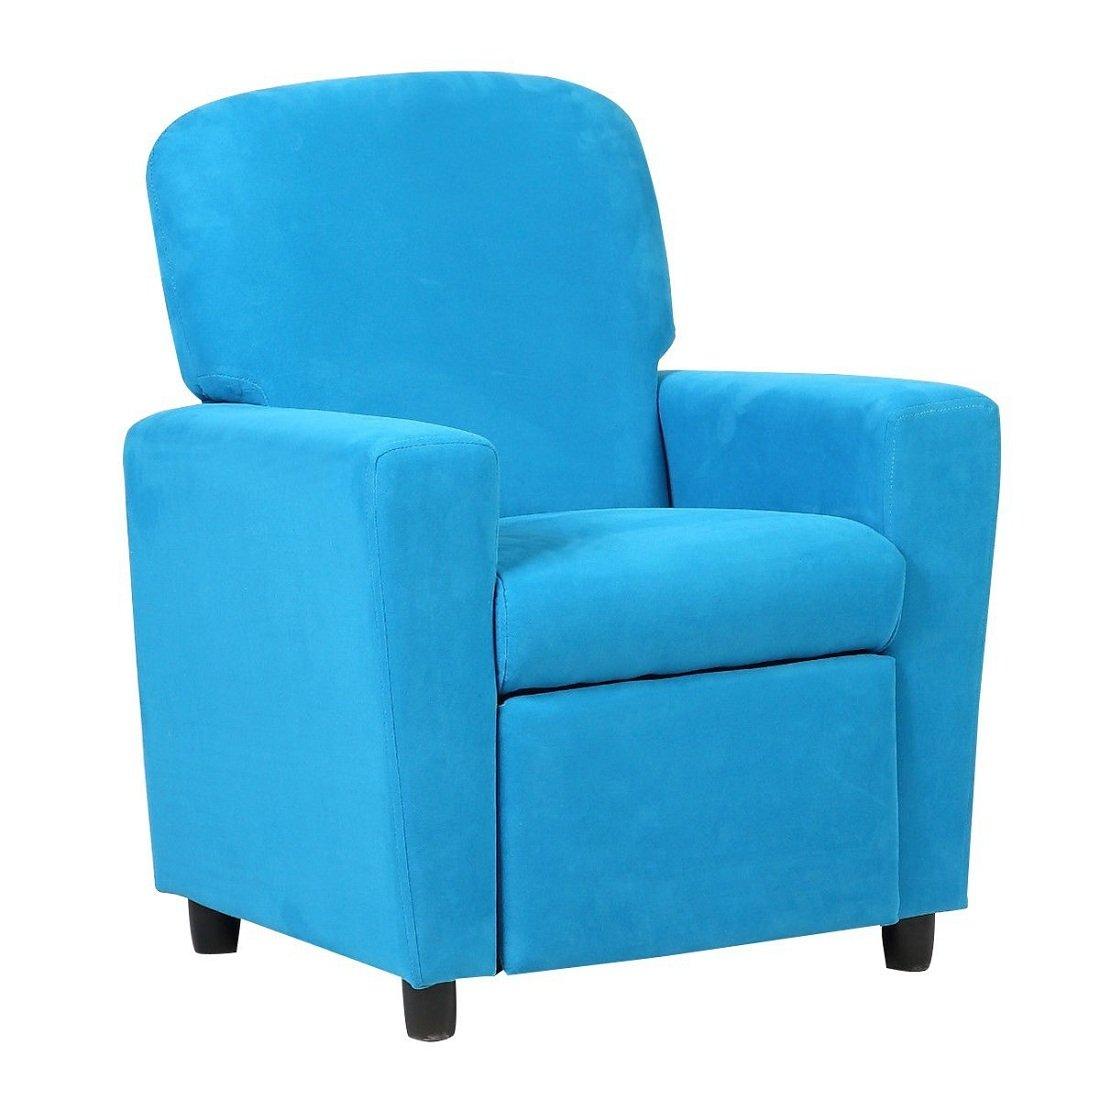 Kids Sofa Armrest Chair Contemporary Blue Microfiber Kids Recliner Children Living Room Toddler Furniture